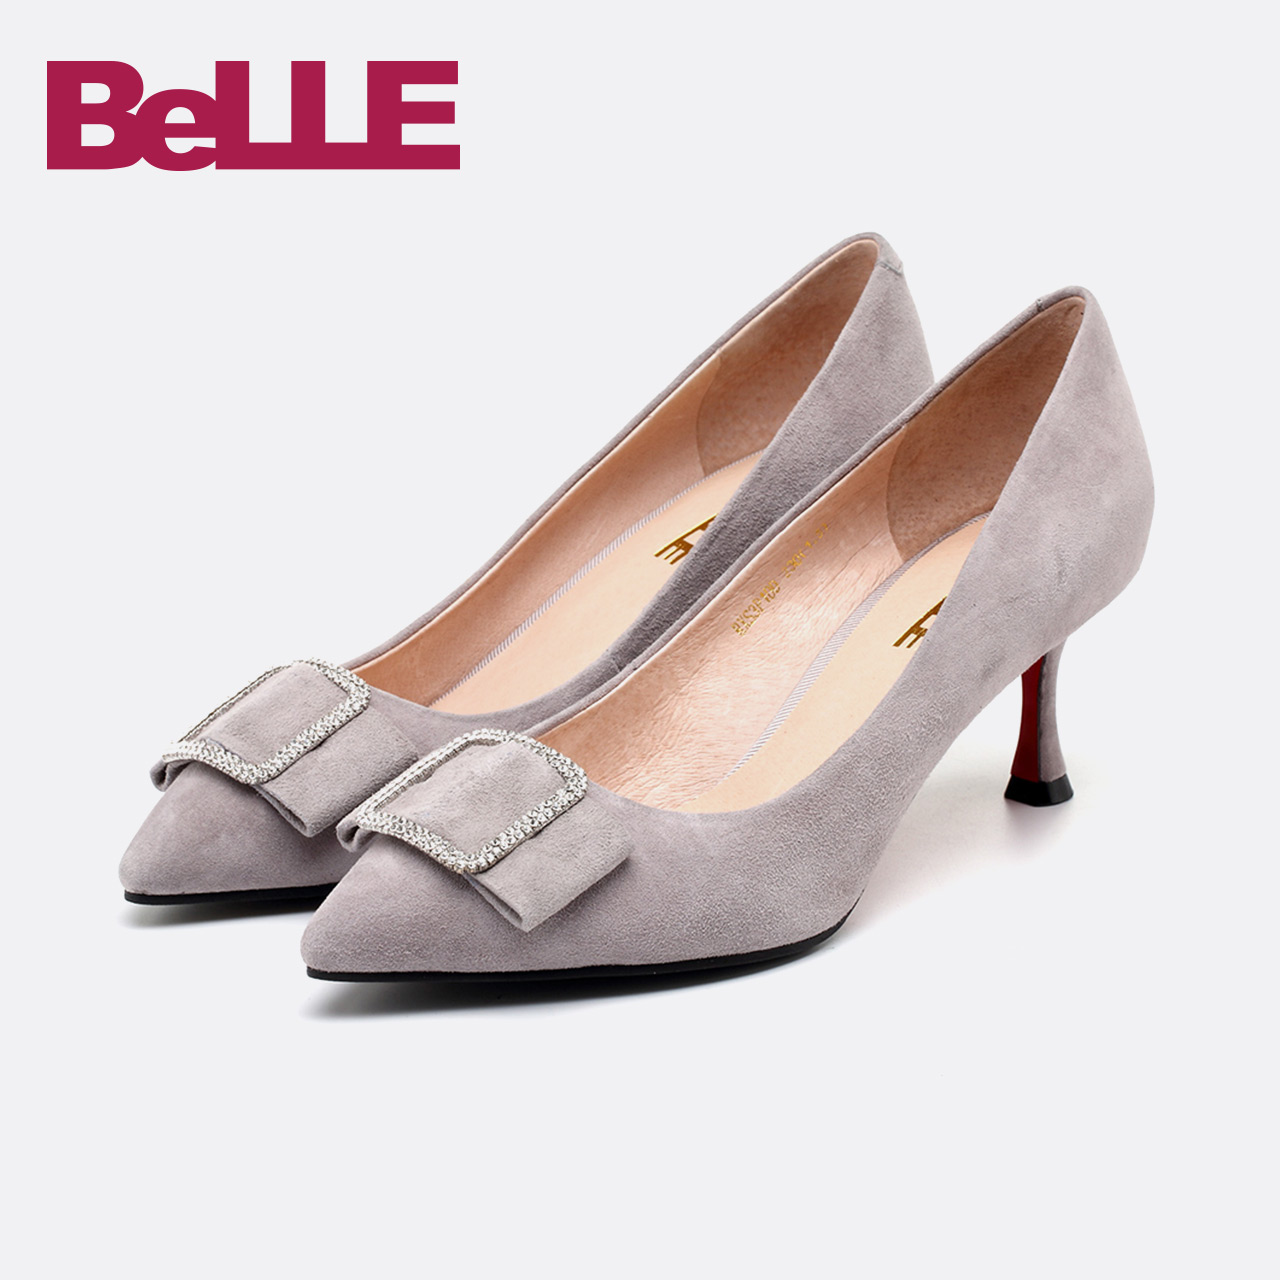 Belle/百丽单鞋2018春新款商场羊绒皮蝴蝶结闪钻女鞋S3P1DAQ8